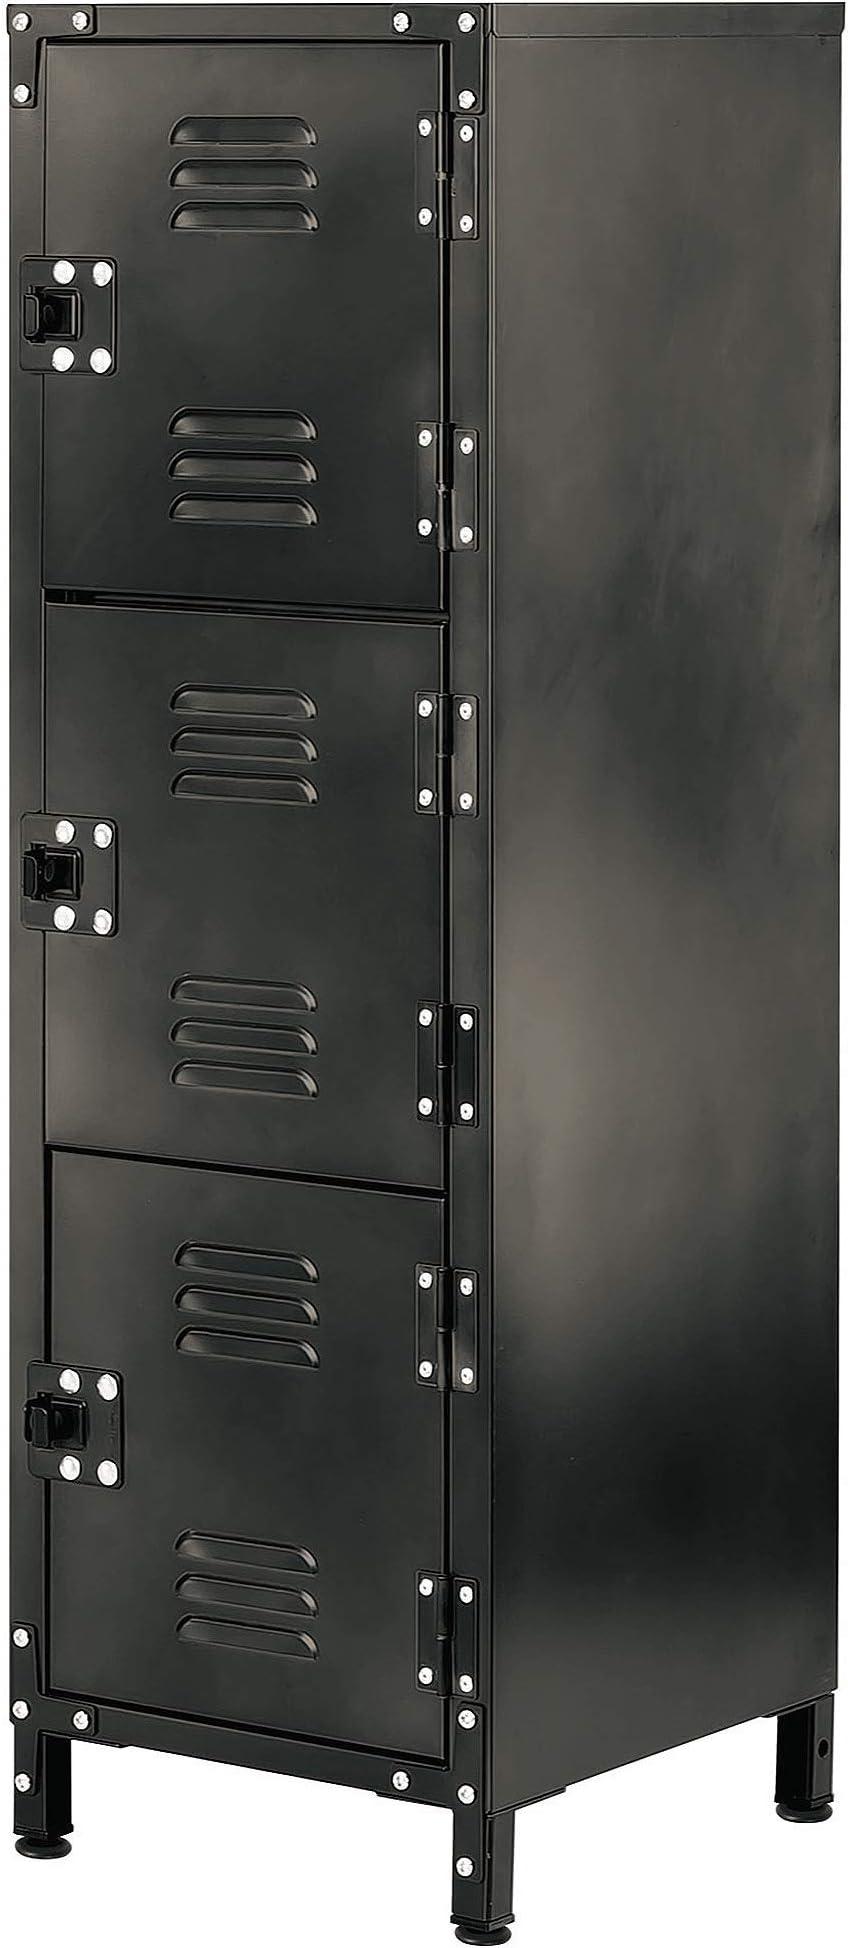 Allspace 3 Door Steel Storage Wardrobe Locker With Dark Weathered Finish, Vintage, Industrial, for Clothing,Home, Office, School, Dorm, Teen, Shop, Vented, Lockable, Durable Powdercoat - 450112E